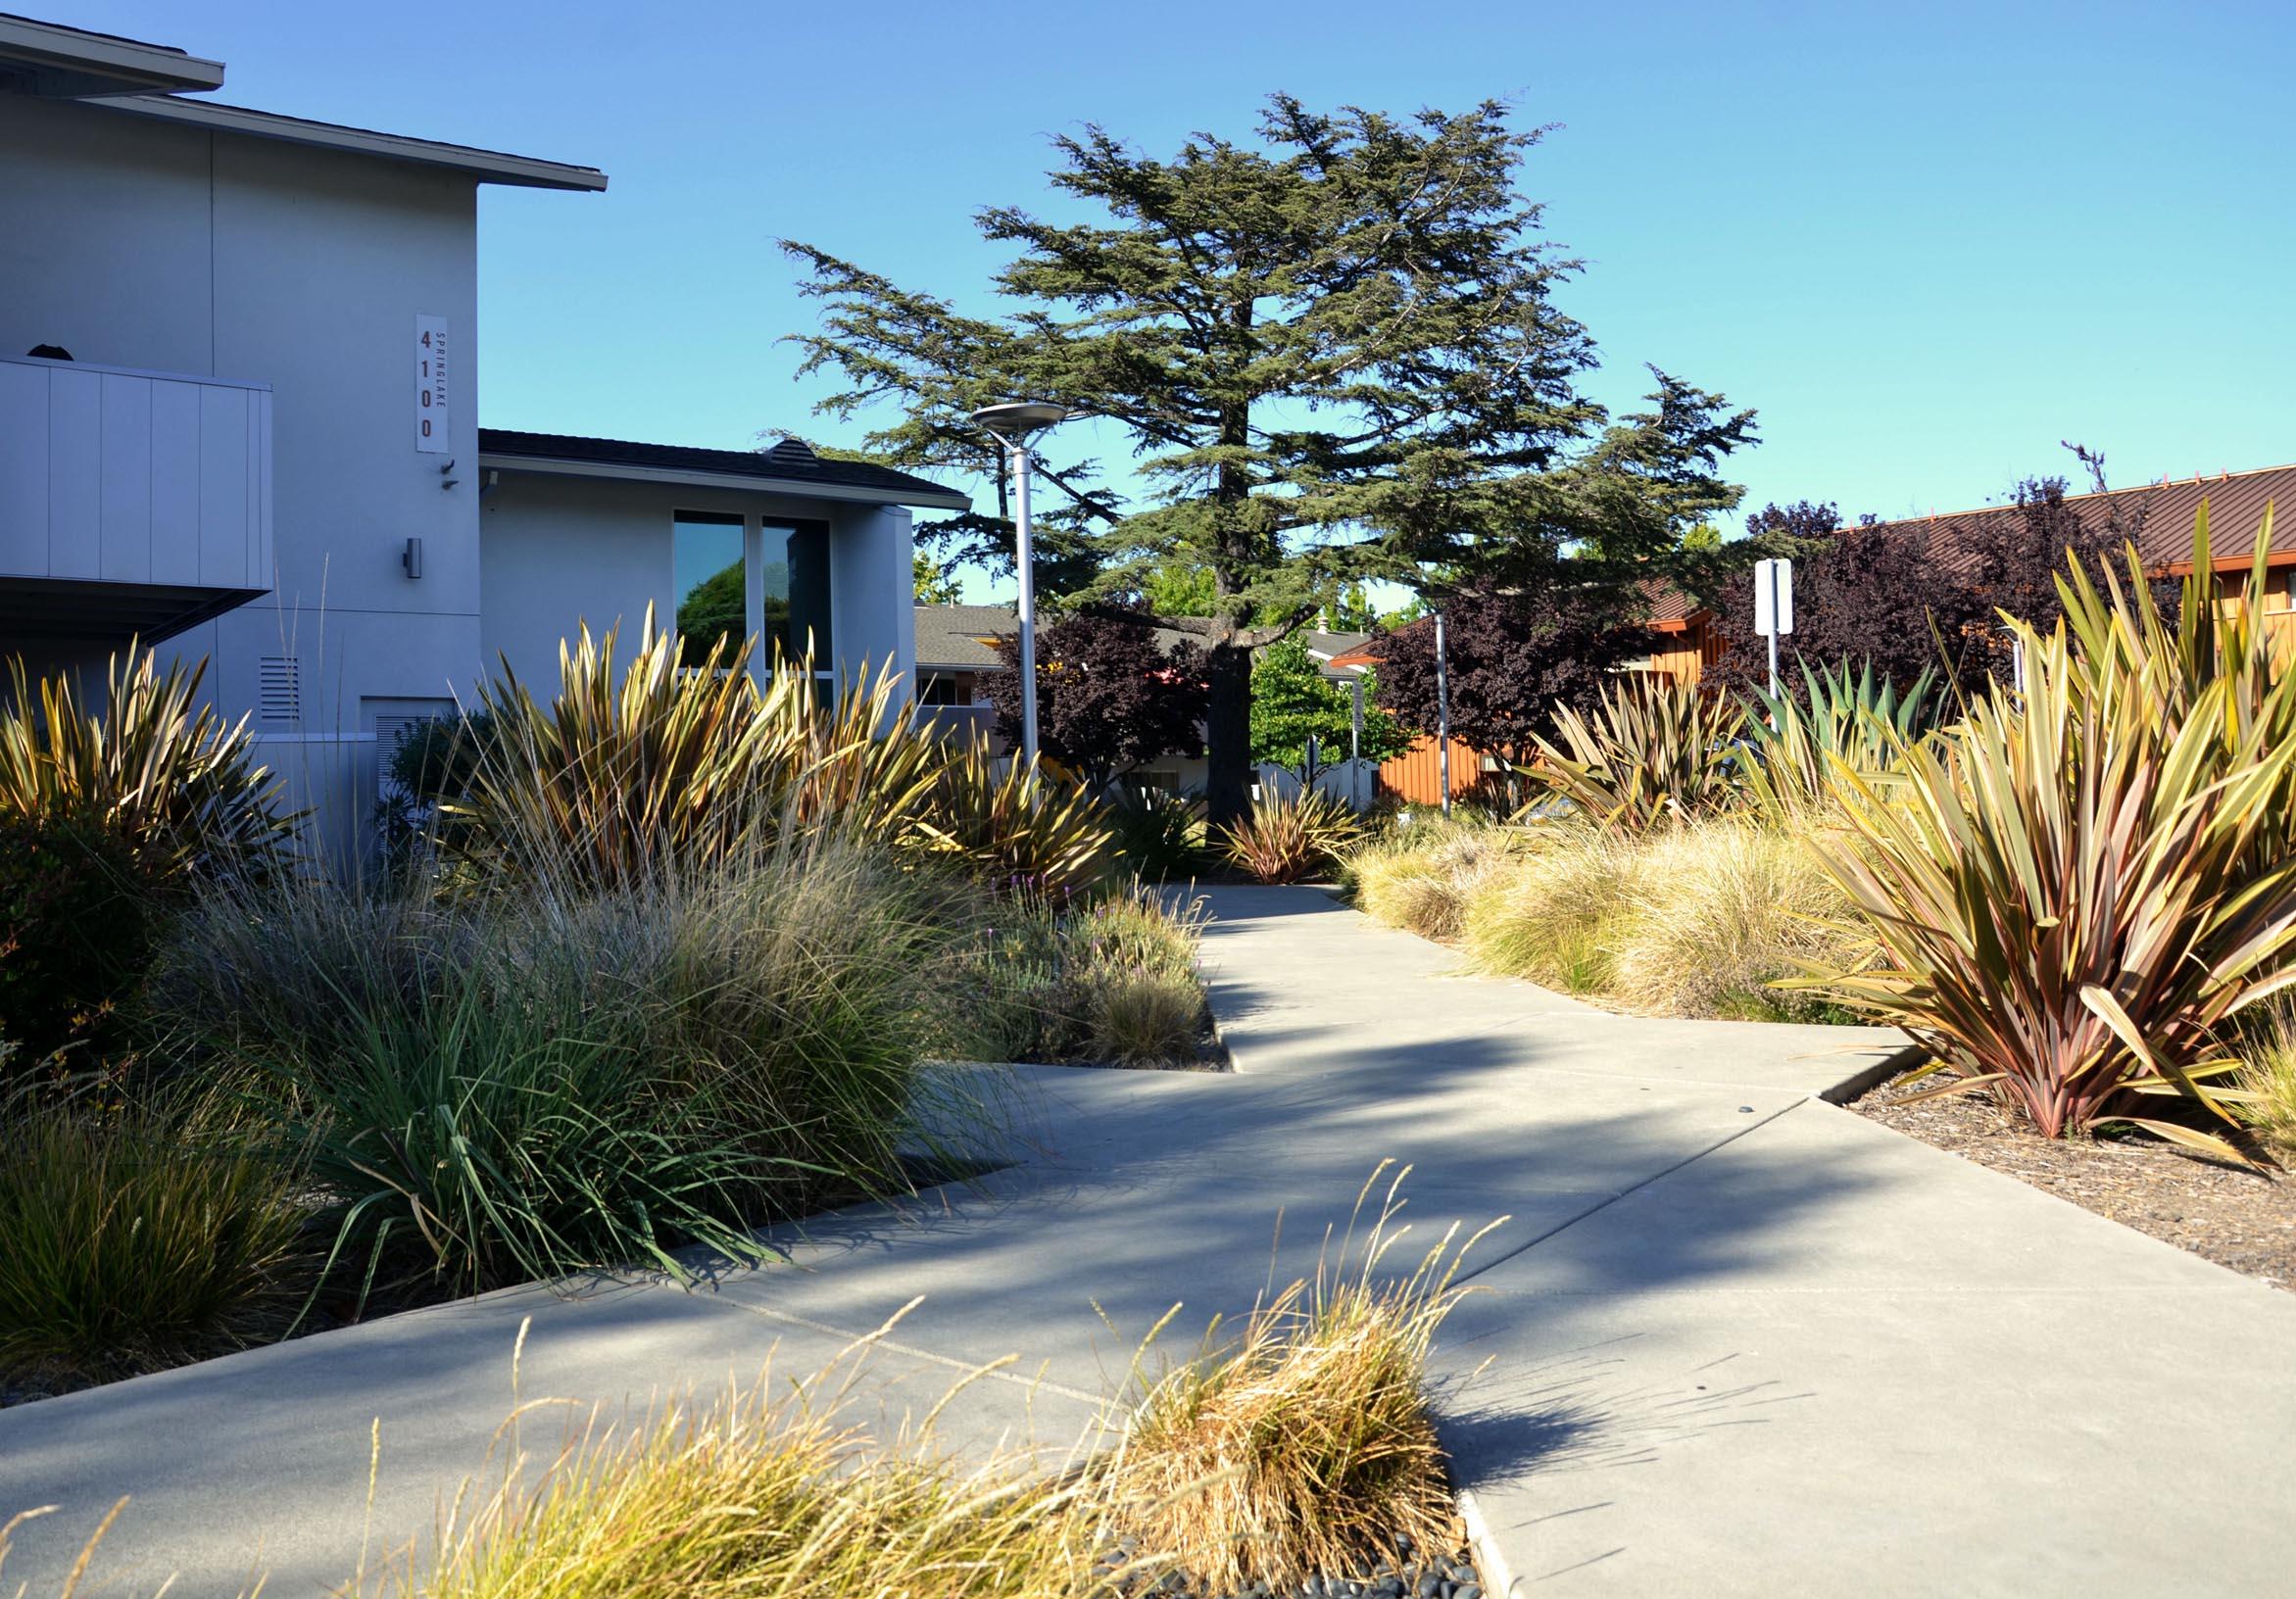 TINA CHEE landscape studio_LAKESIDE-path 2.jpg